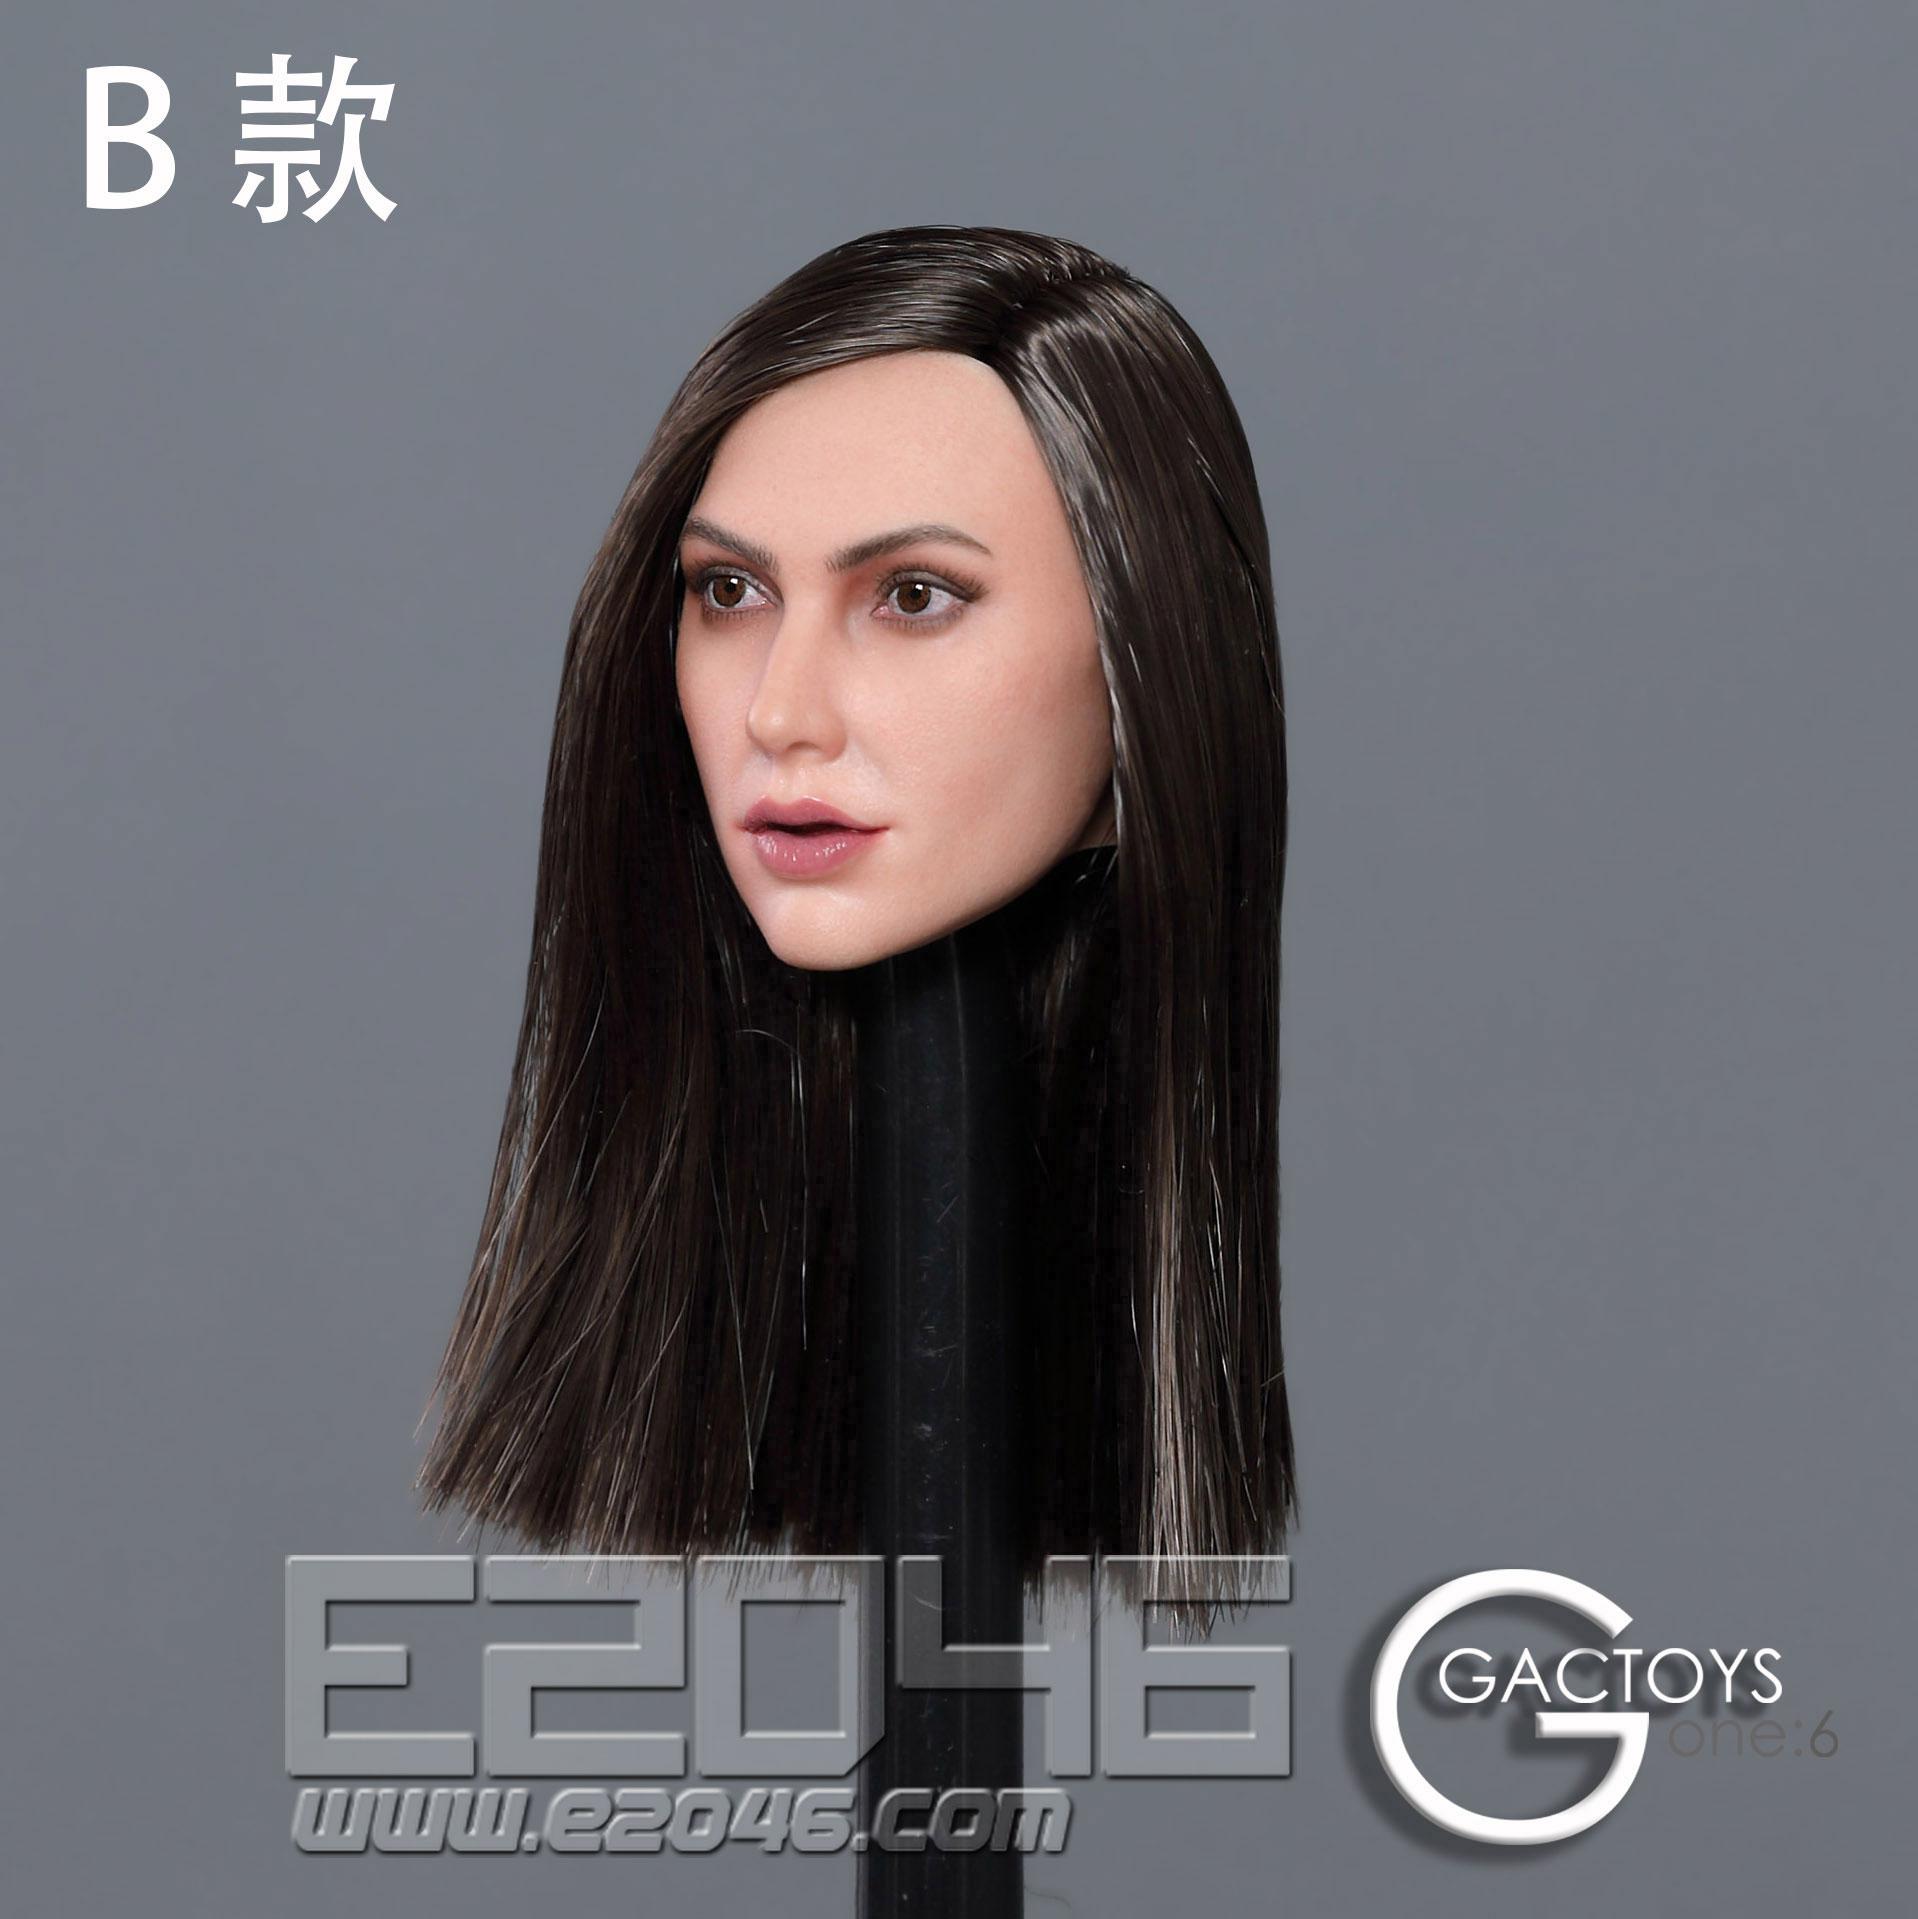 Head Carving B (DOLL)